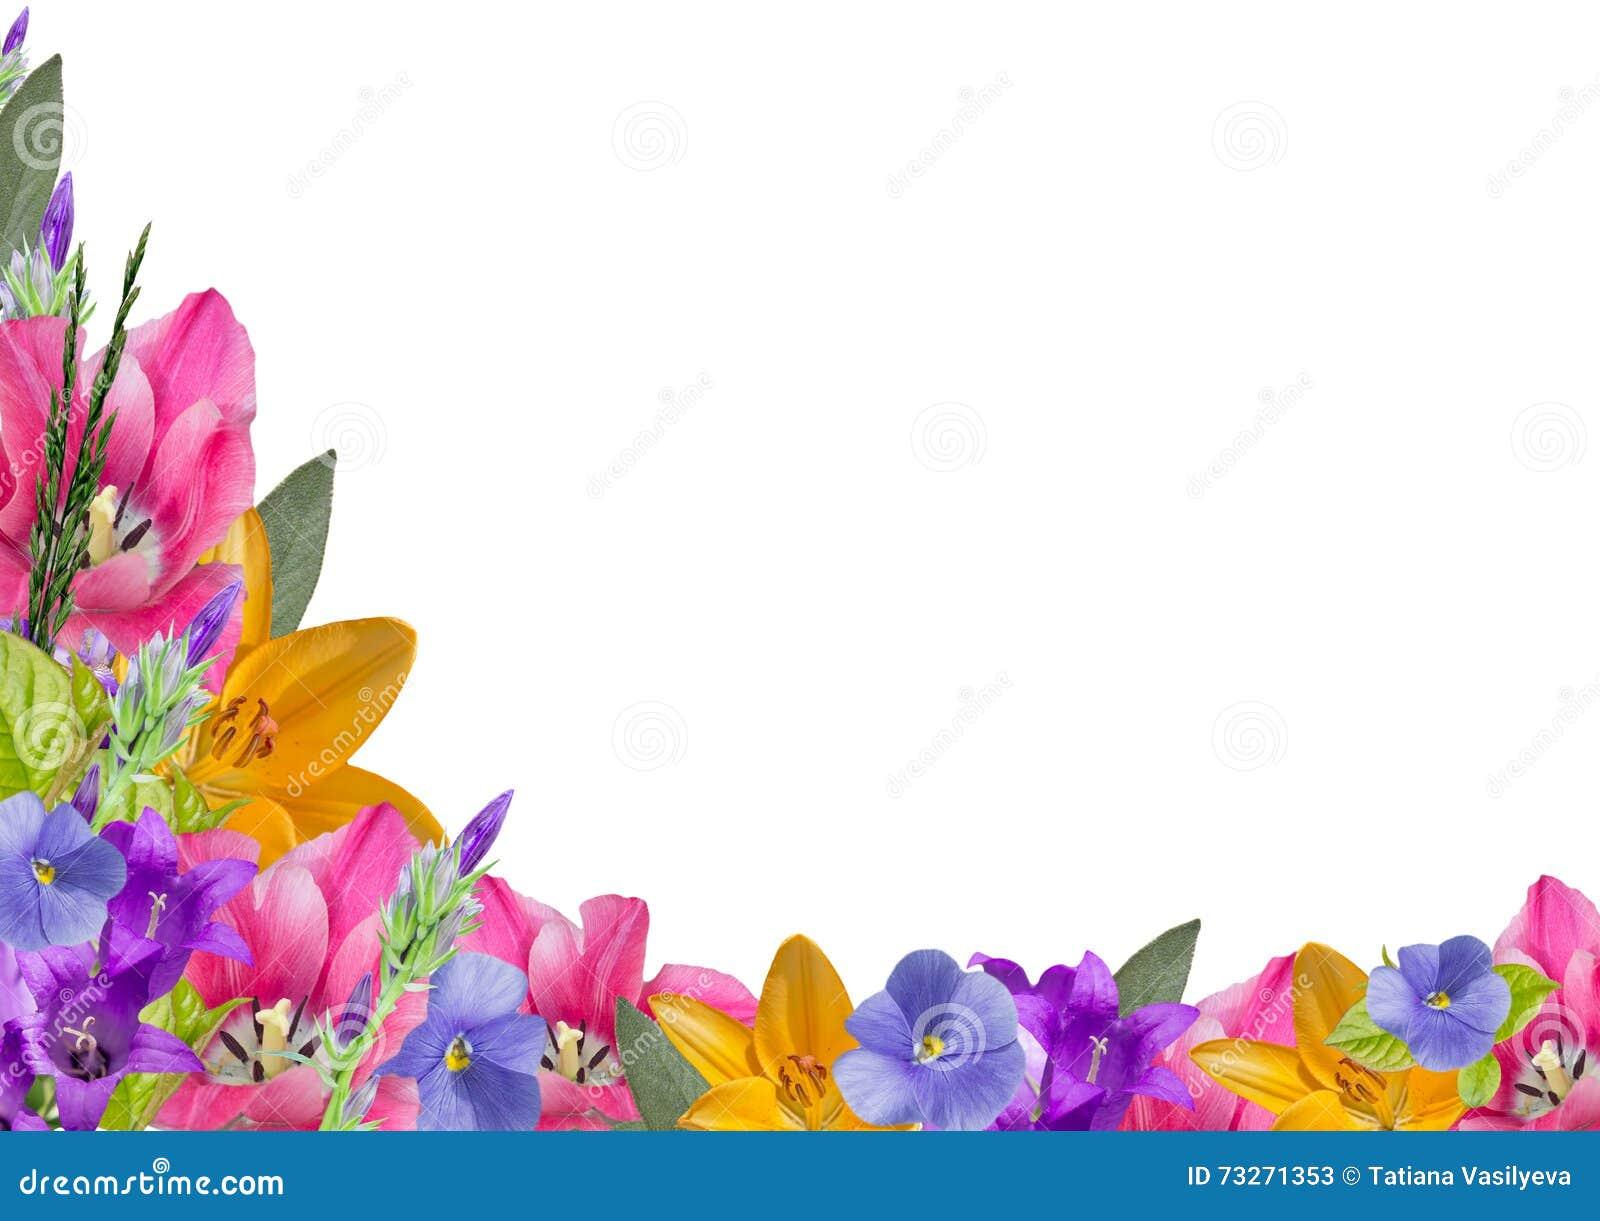 Horizontal Frame Flowers Border Stock Photos - 816 Images